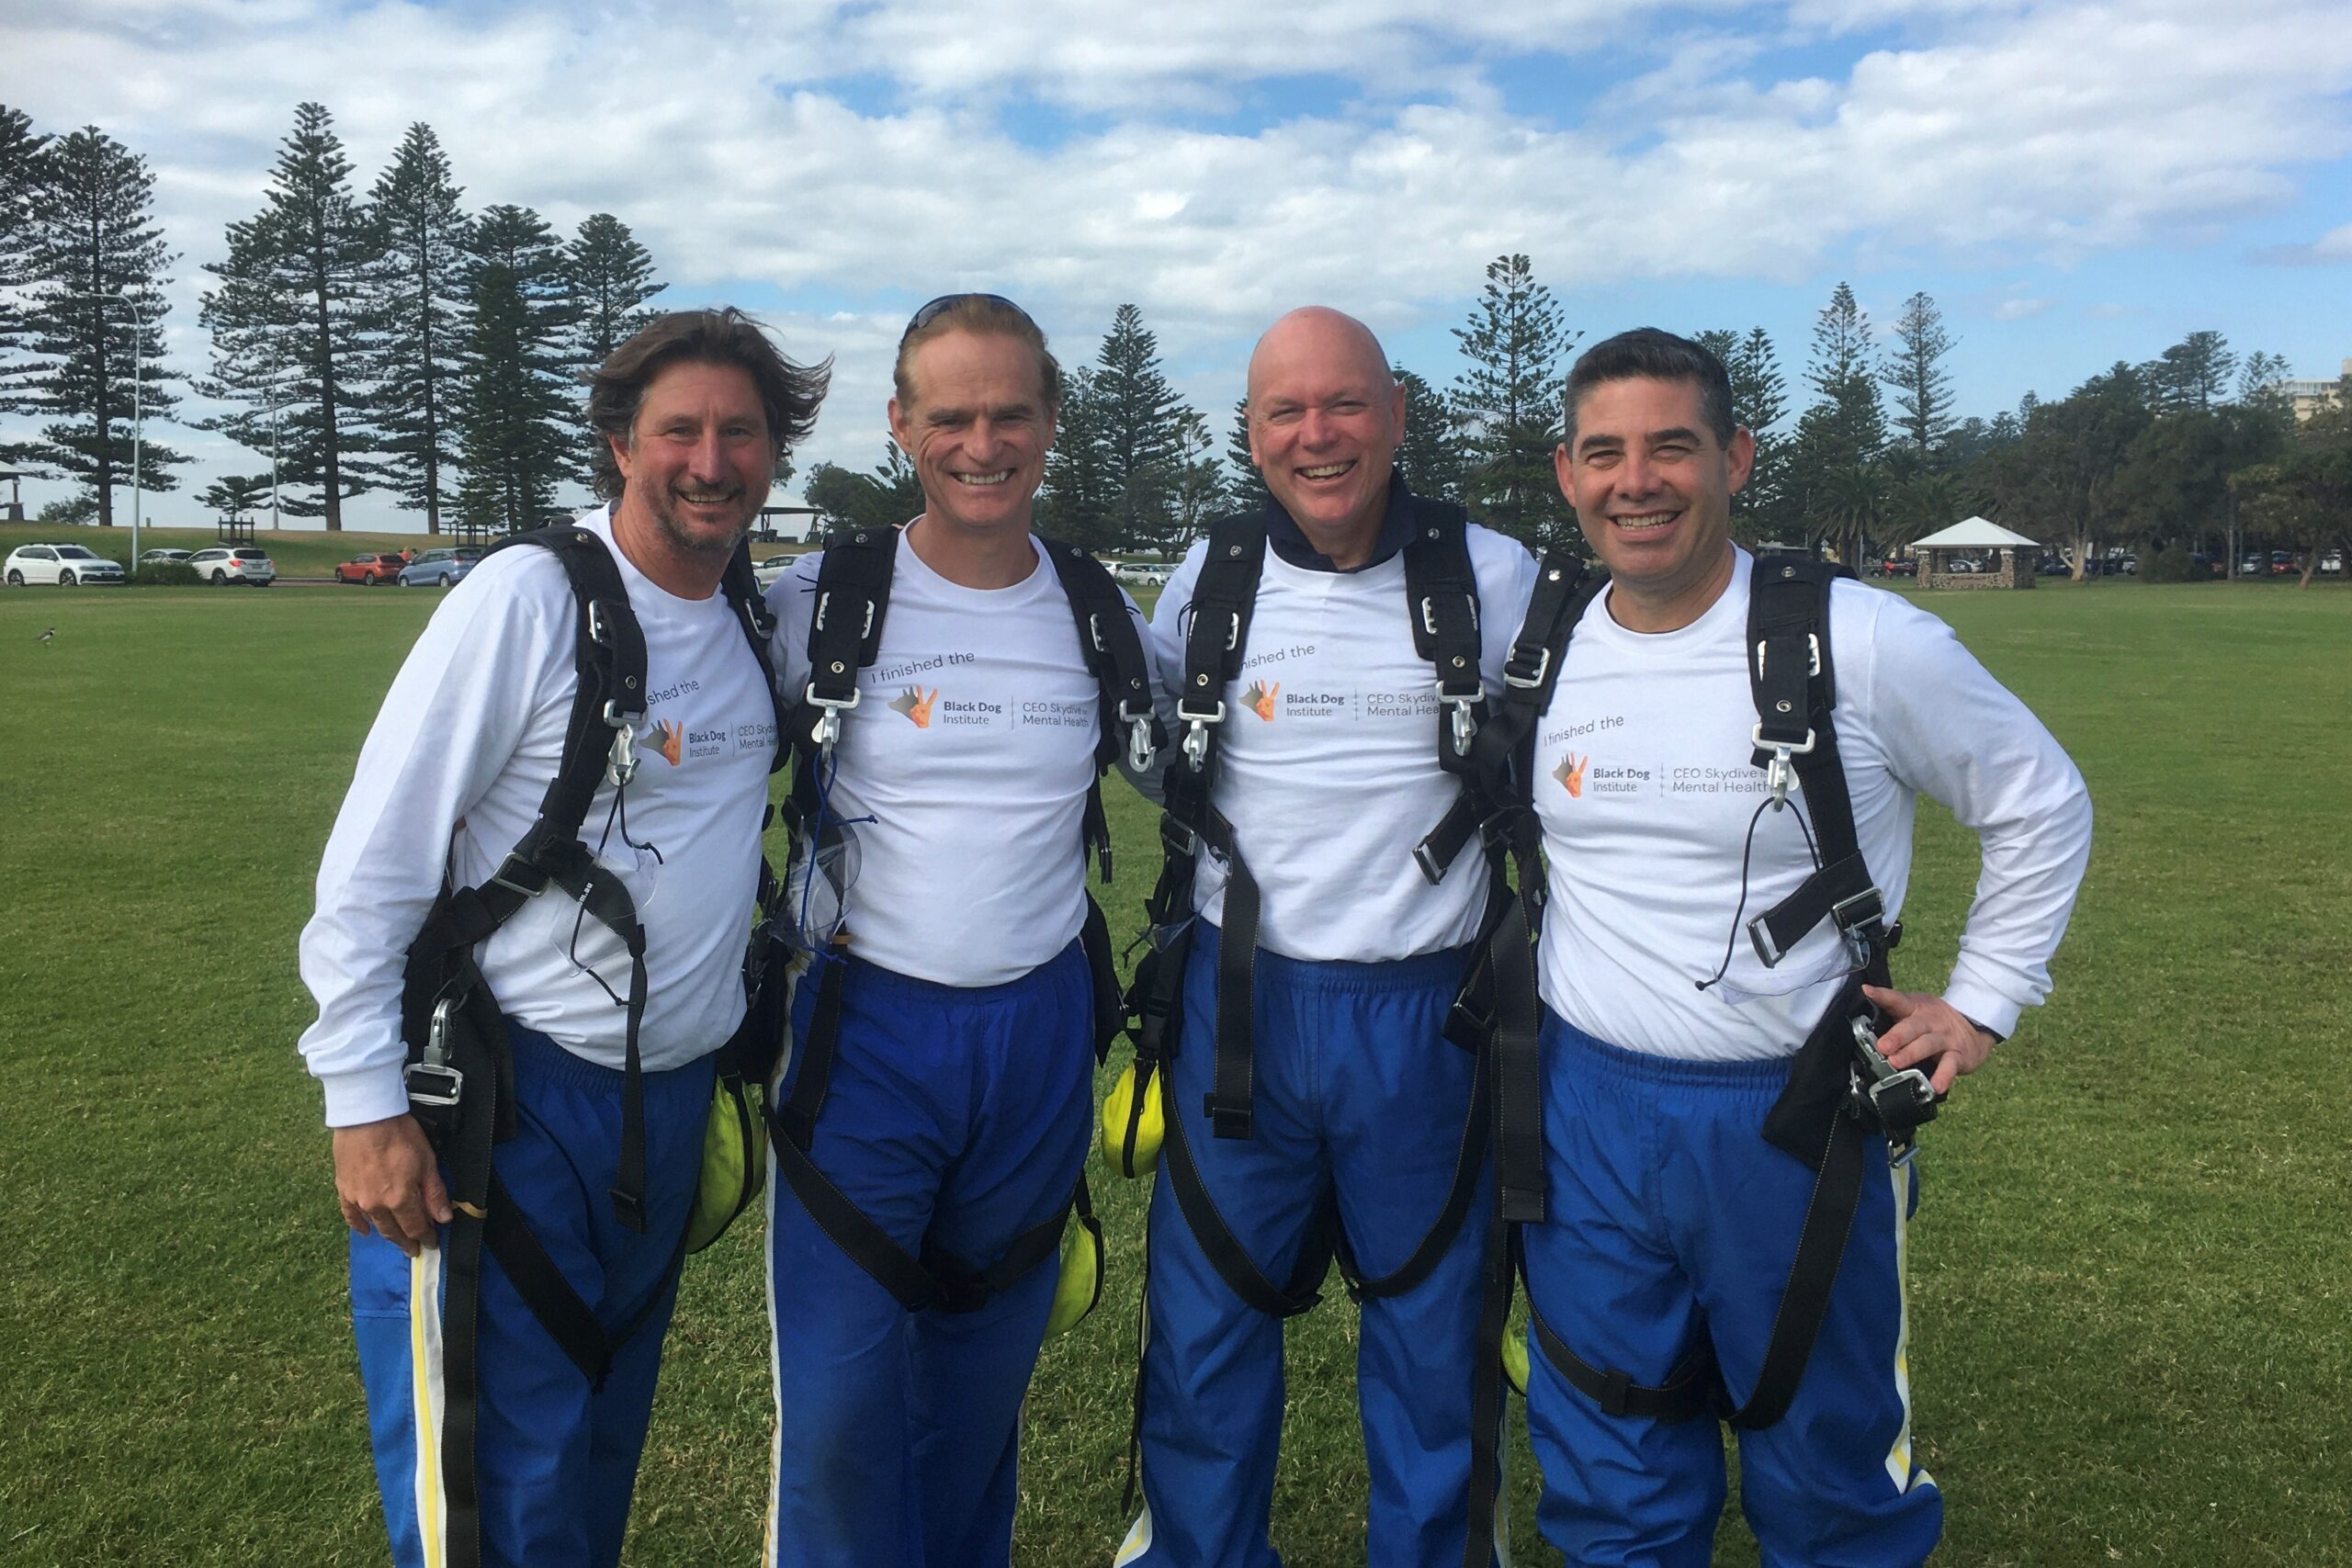 Insurance CEOs Skydive A